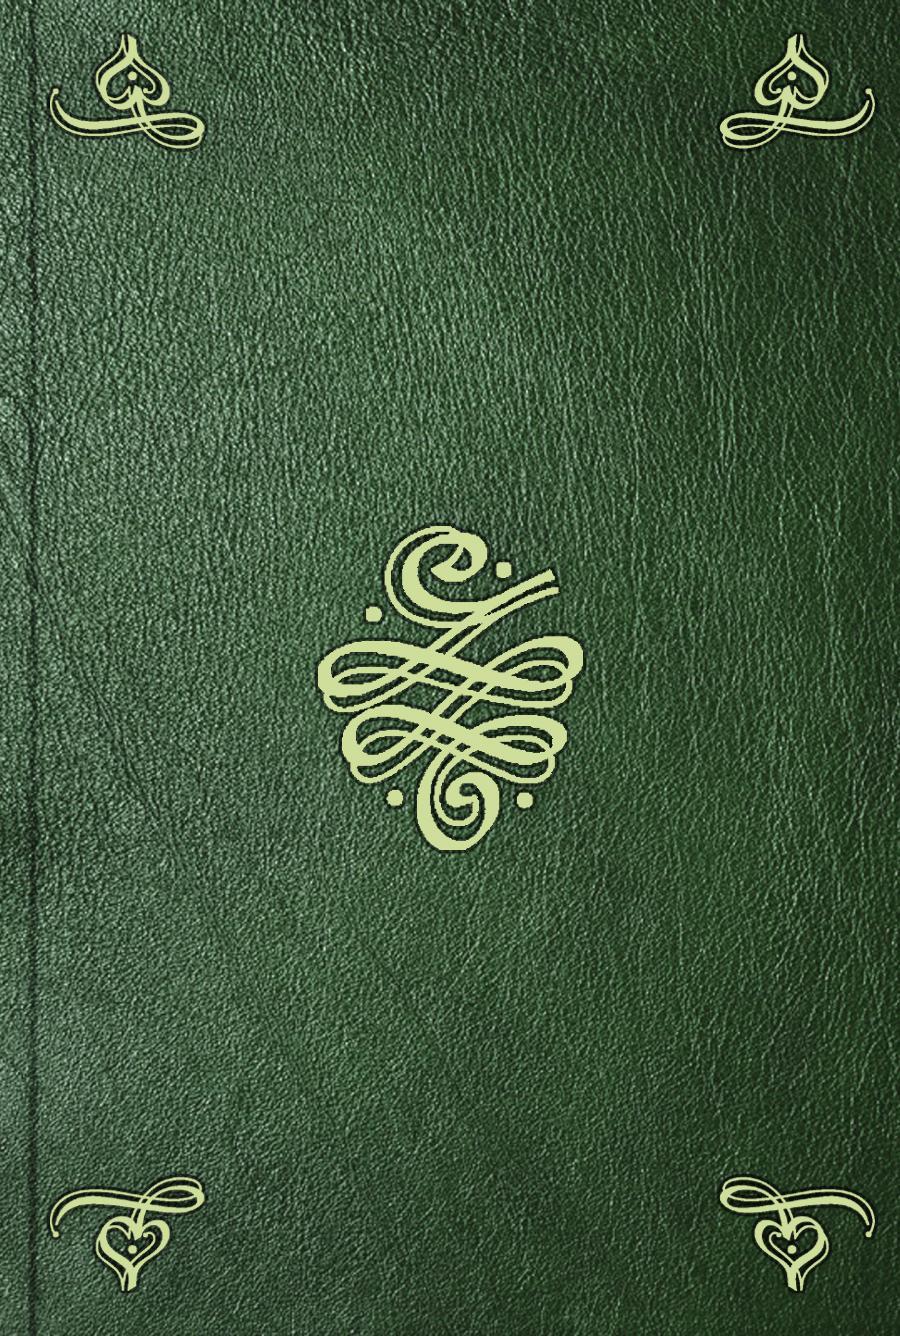 de Caylus Oeuvres badines complettes. T. 5. P. 2 anthony ashley shaftsbury les oeuvres de mylord comte de shaftsbury t 3